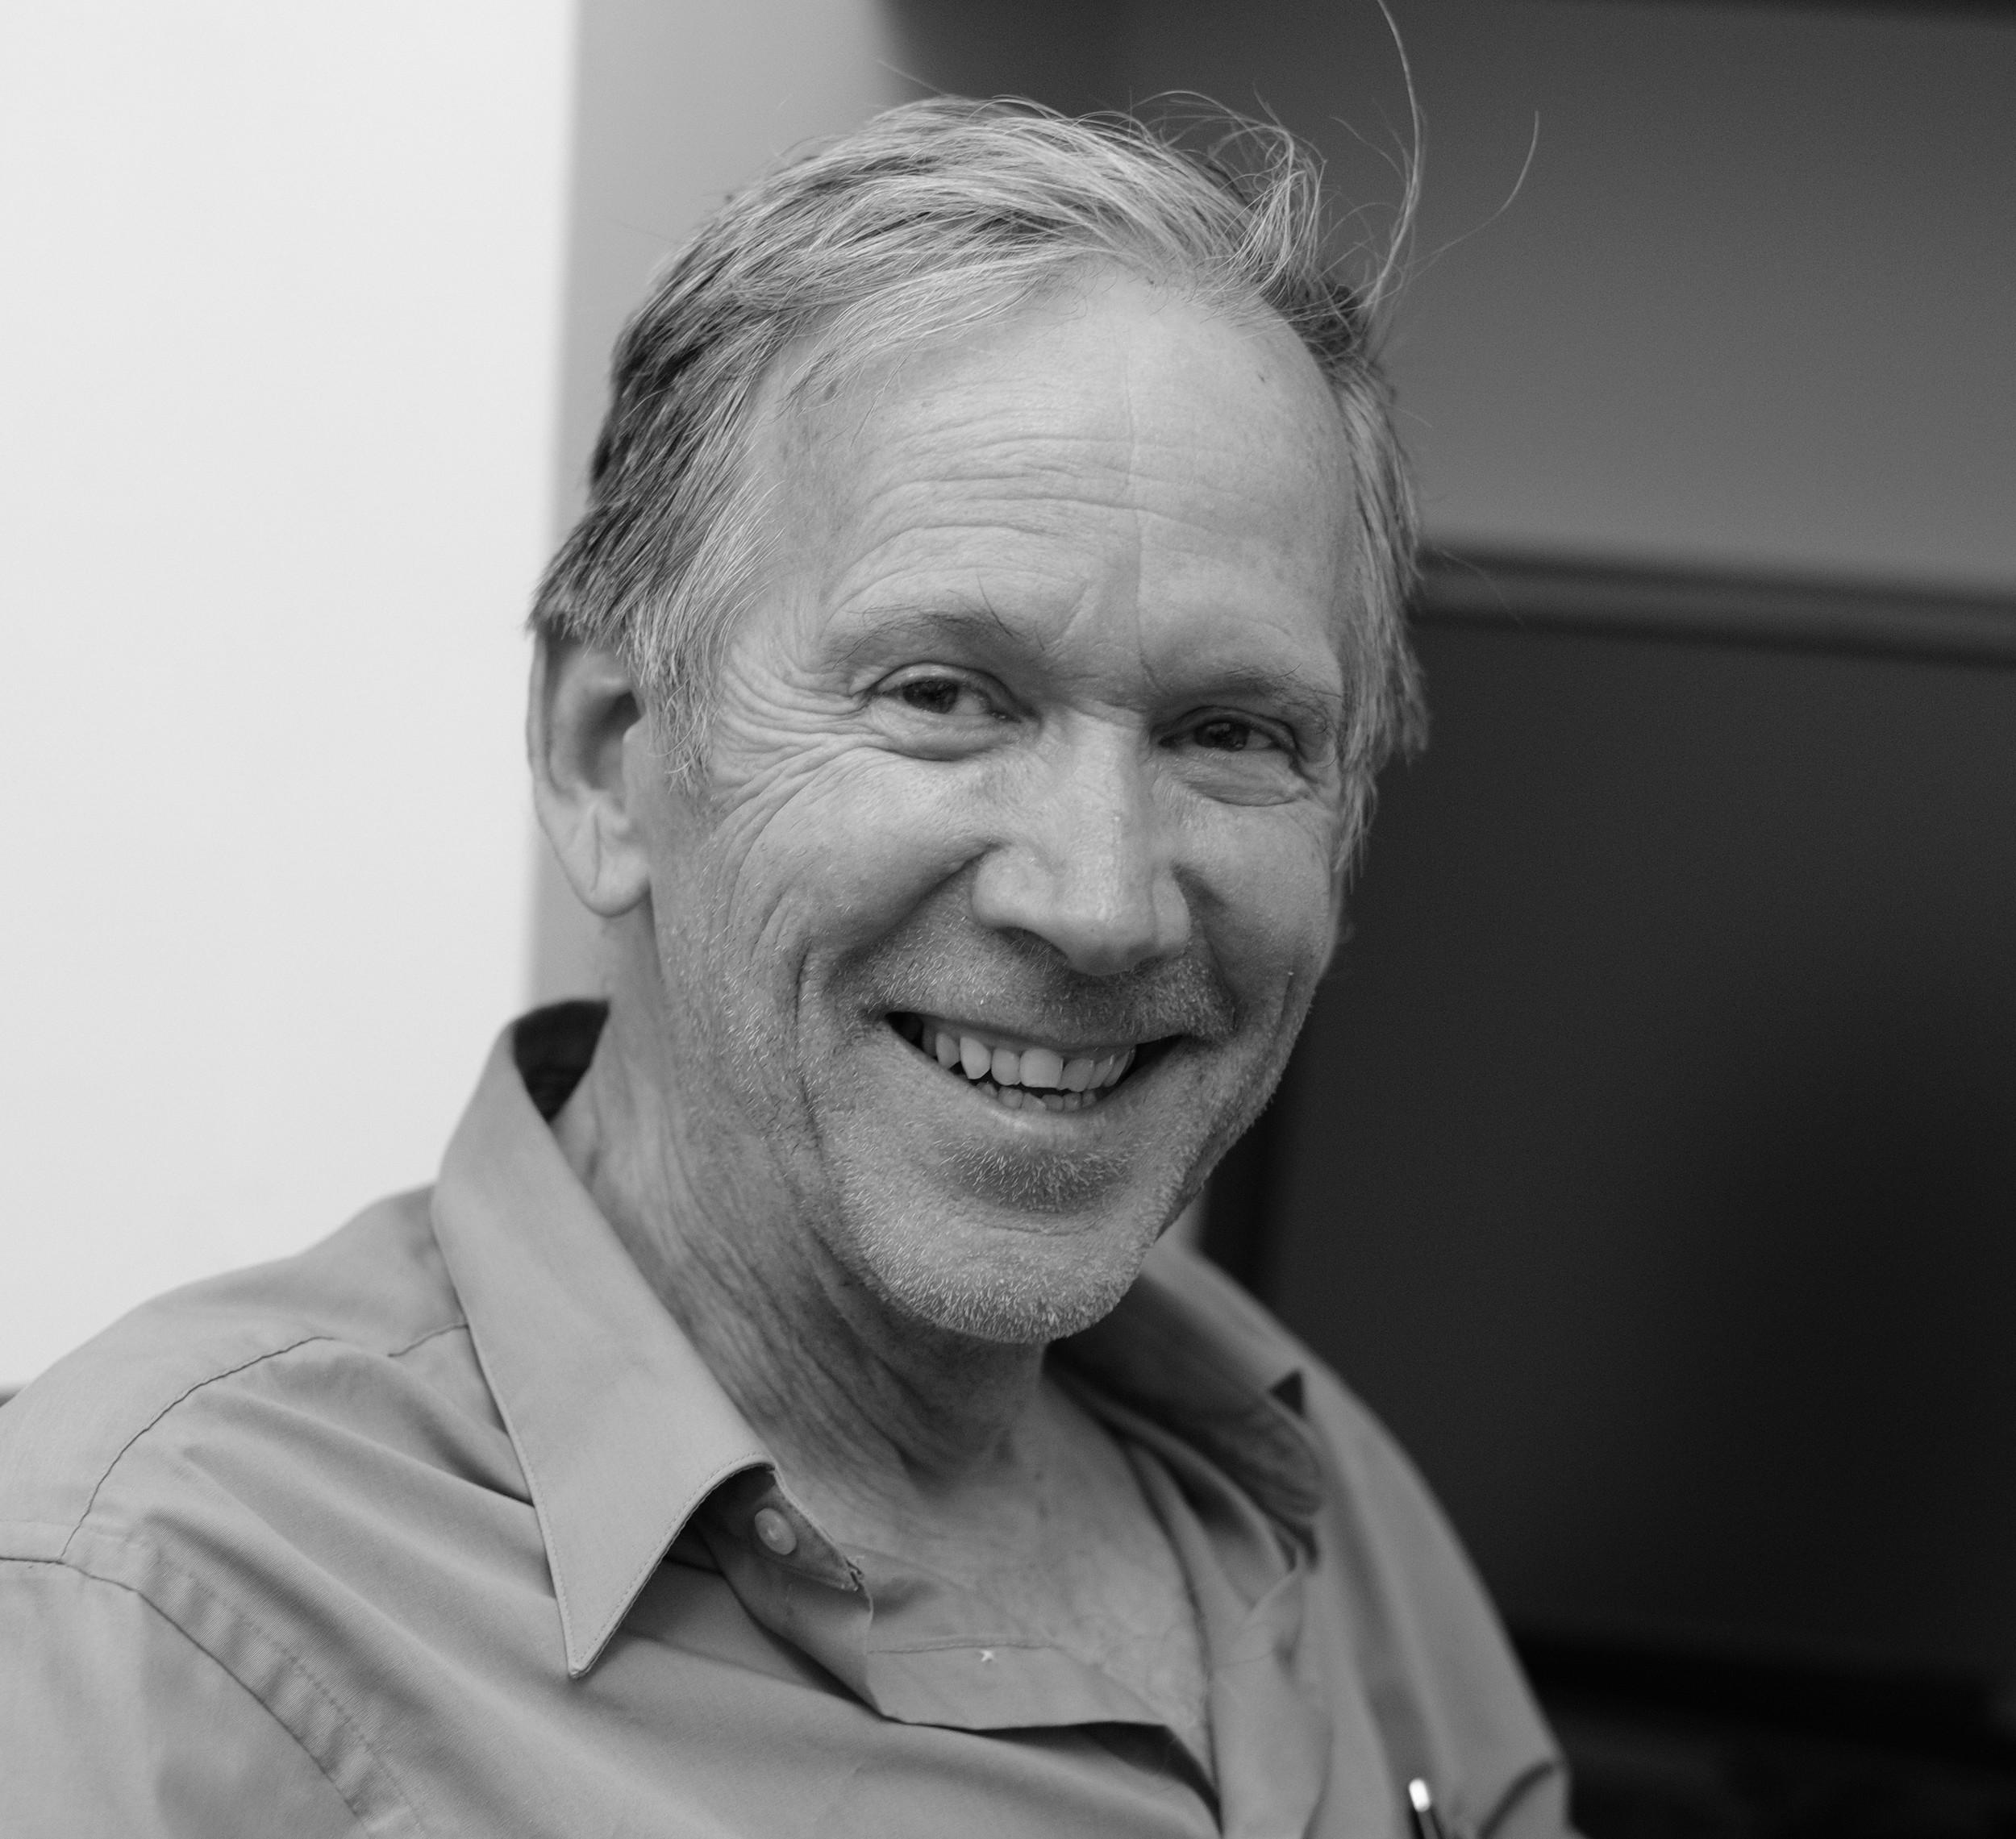 ROBERT JAMES<BR>RA, Principal Director of Architectural Services